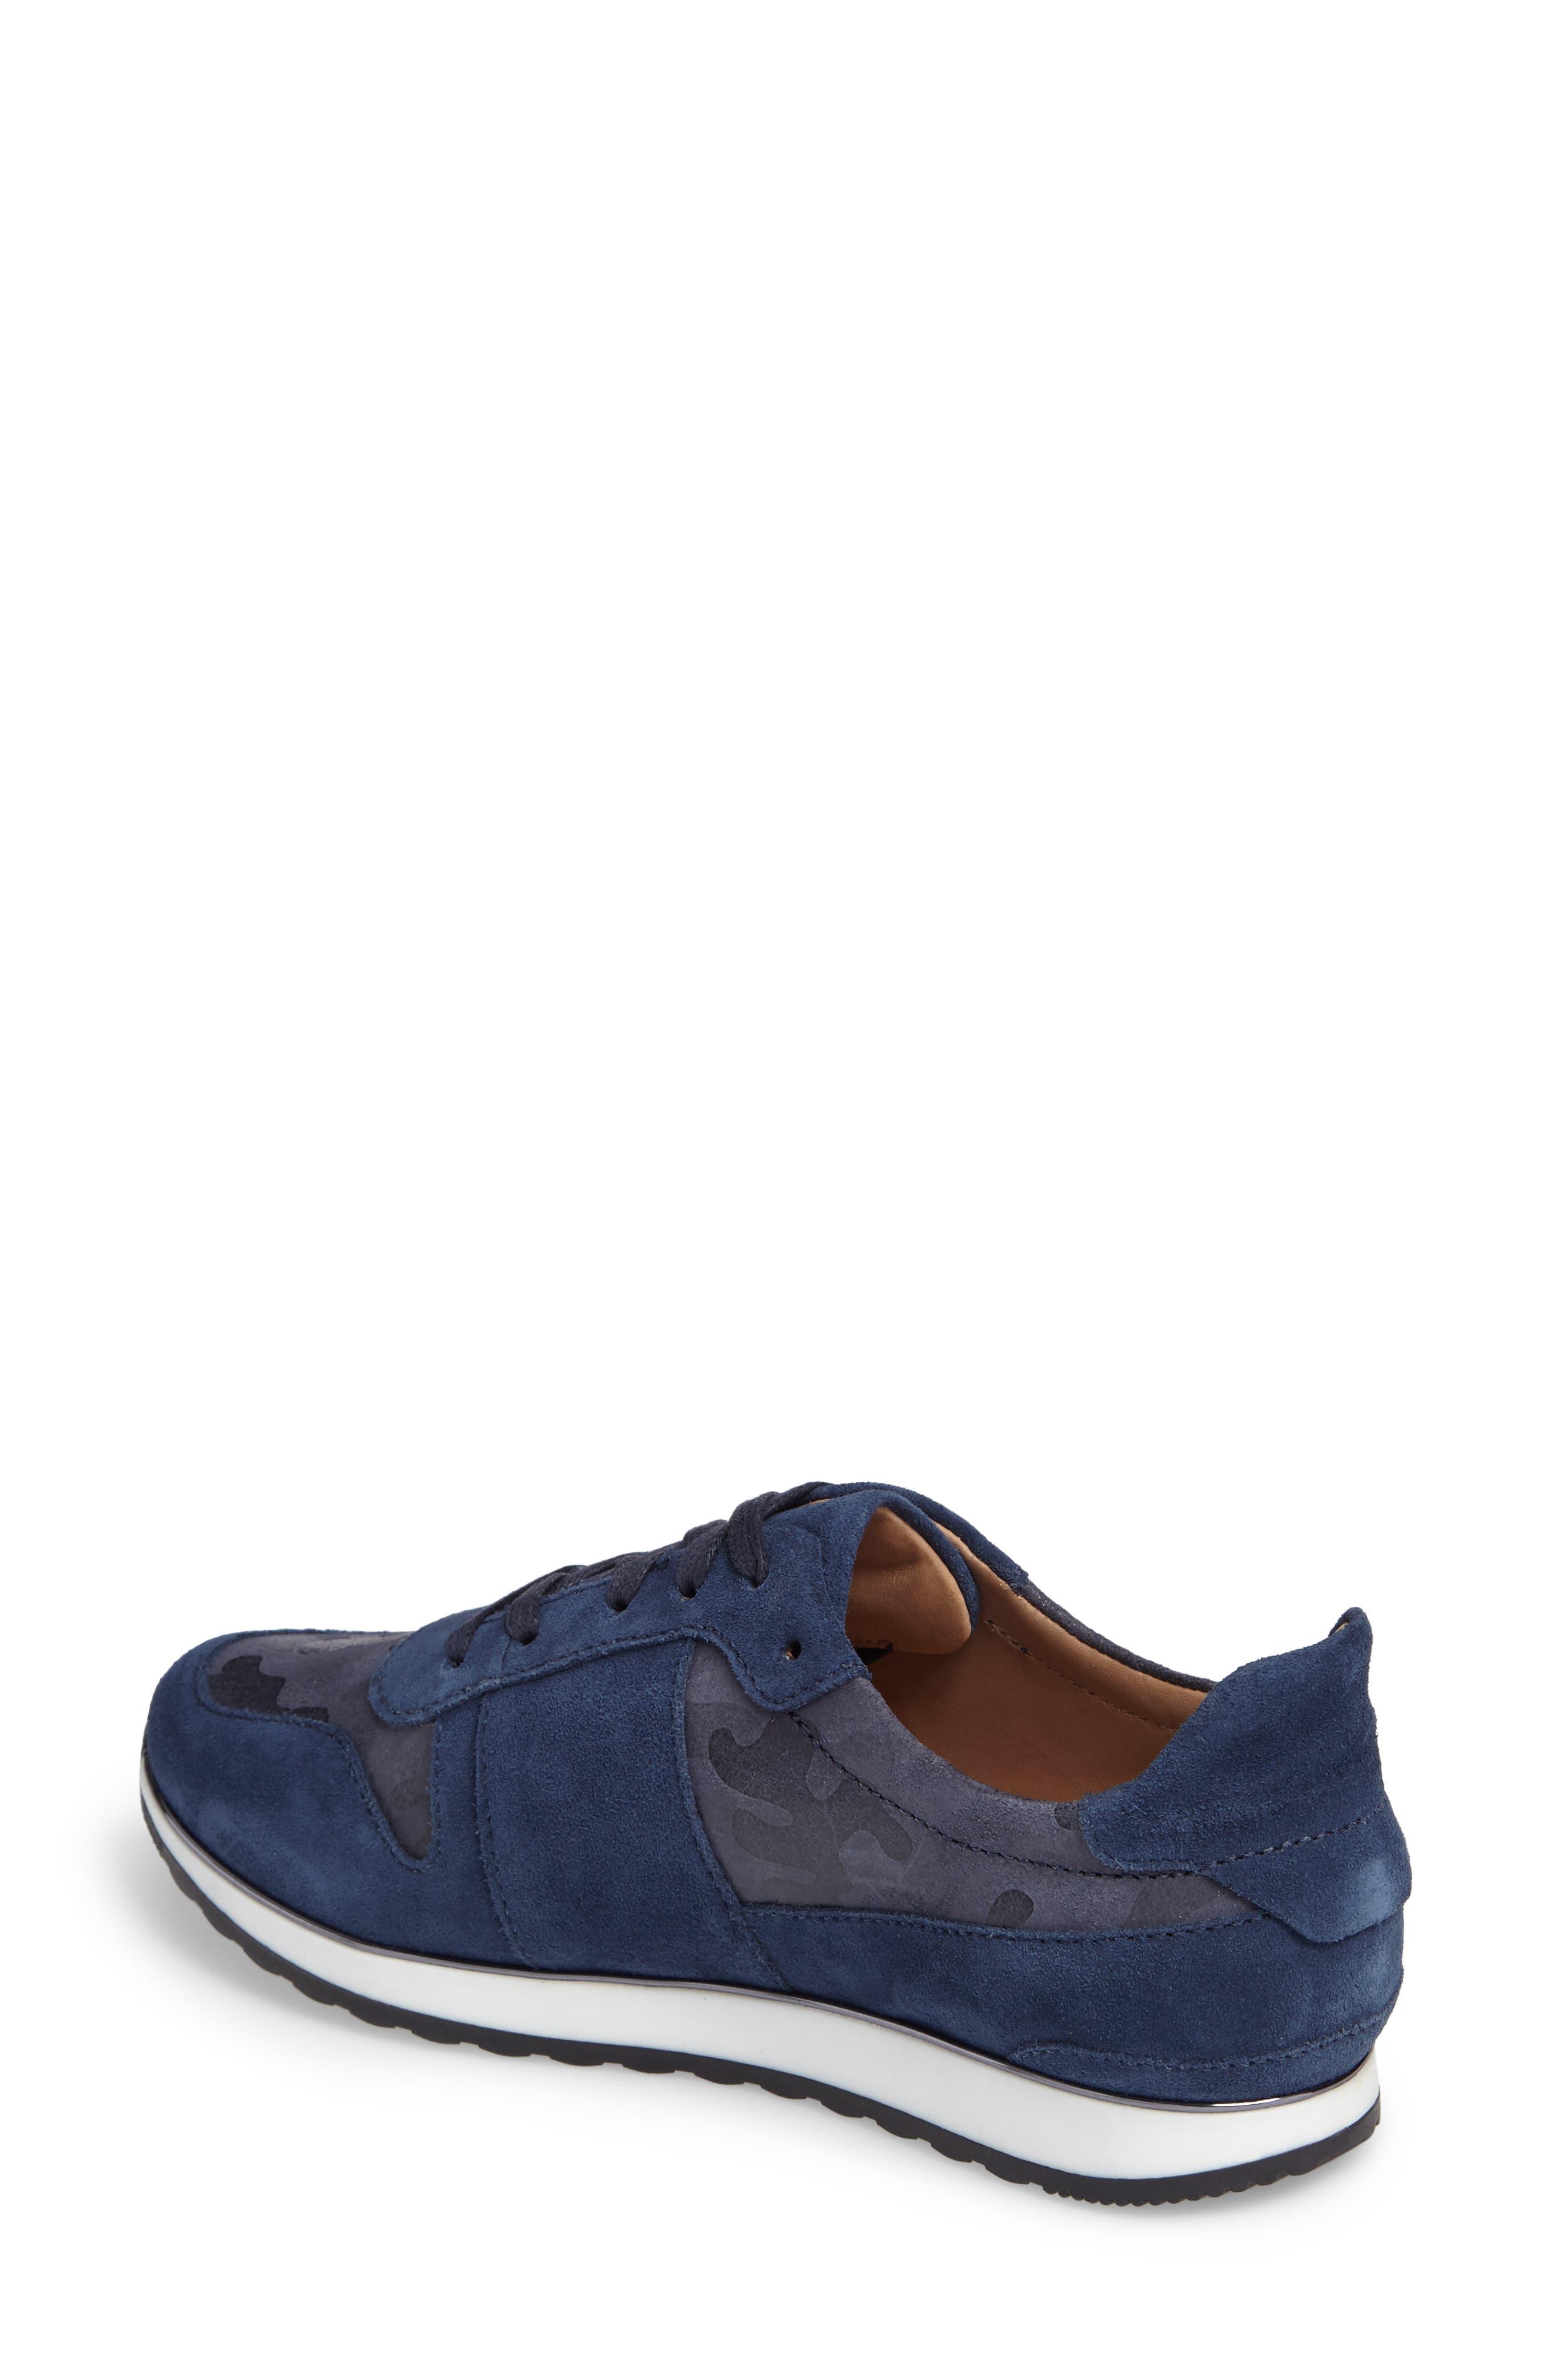 Stefani Sneaker,                             Alternate thumbnail 2, color,                             Camo Nubuck Leather